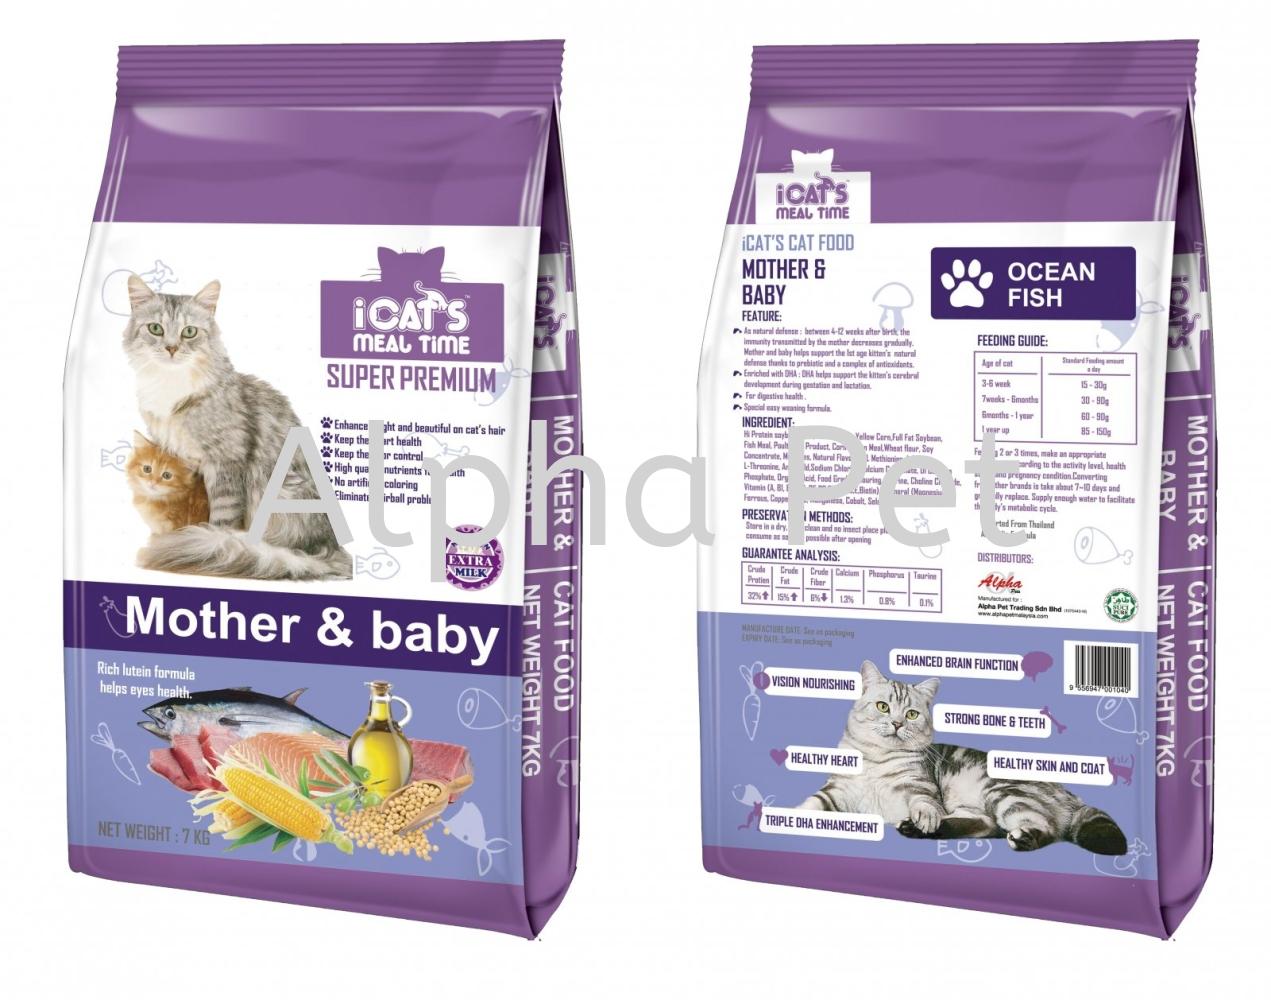 iCAT'S Premium Cat Food - Mother & Baby